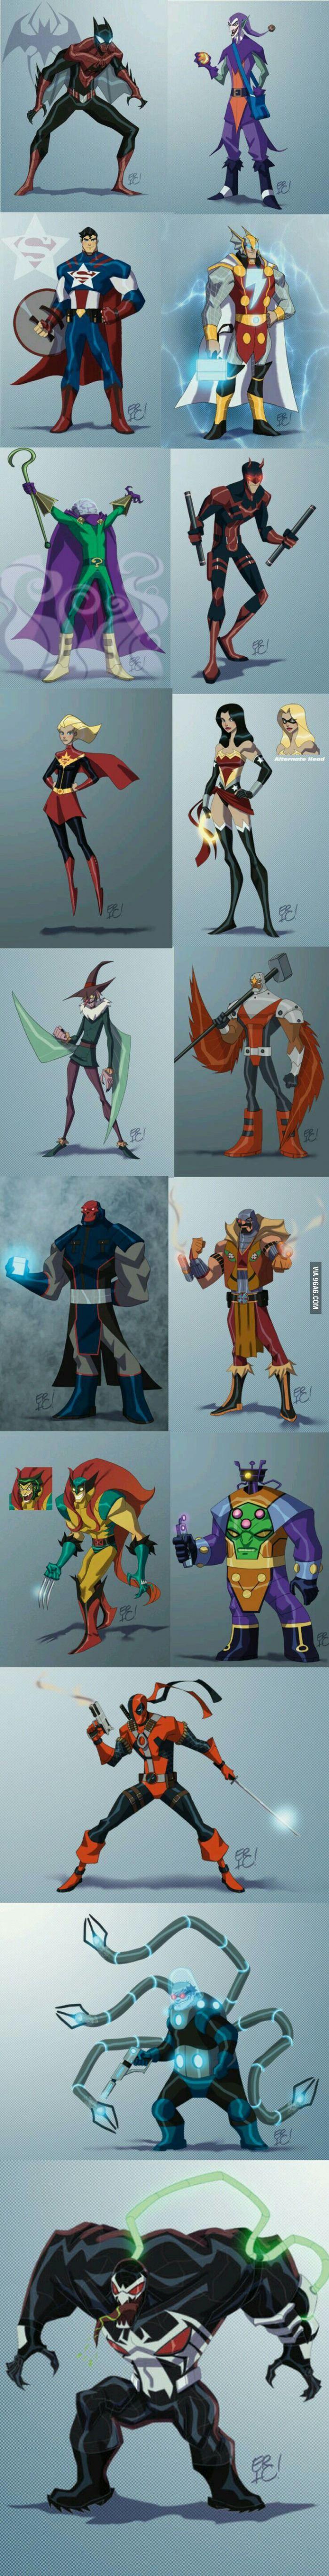 Marvel - DC mashup | Spider-man+Batman; Green Goblin+Joker; Captain America+Superman; Shazam+Thor; Mysterio+Riddler; Daredevil+Nightwing; Miss Marvel+Wonder Woman; Vulture+Scarecrow; Falcon+Steel; The Red Skull+Darkseid; Kraven the Hunter+Deadshot; Wolverine+Creeper; Arnim Zola+Brainiac; Deadpool; Deathstroke; Dr. Octopus+Mr. Freeze; Venom+Bane;